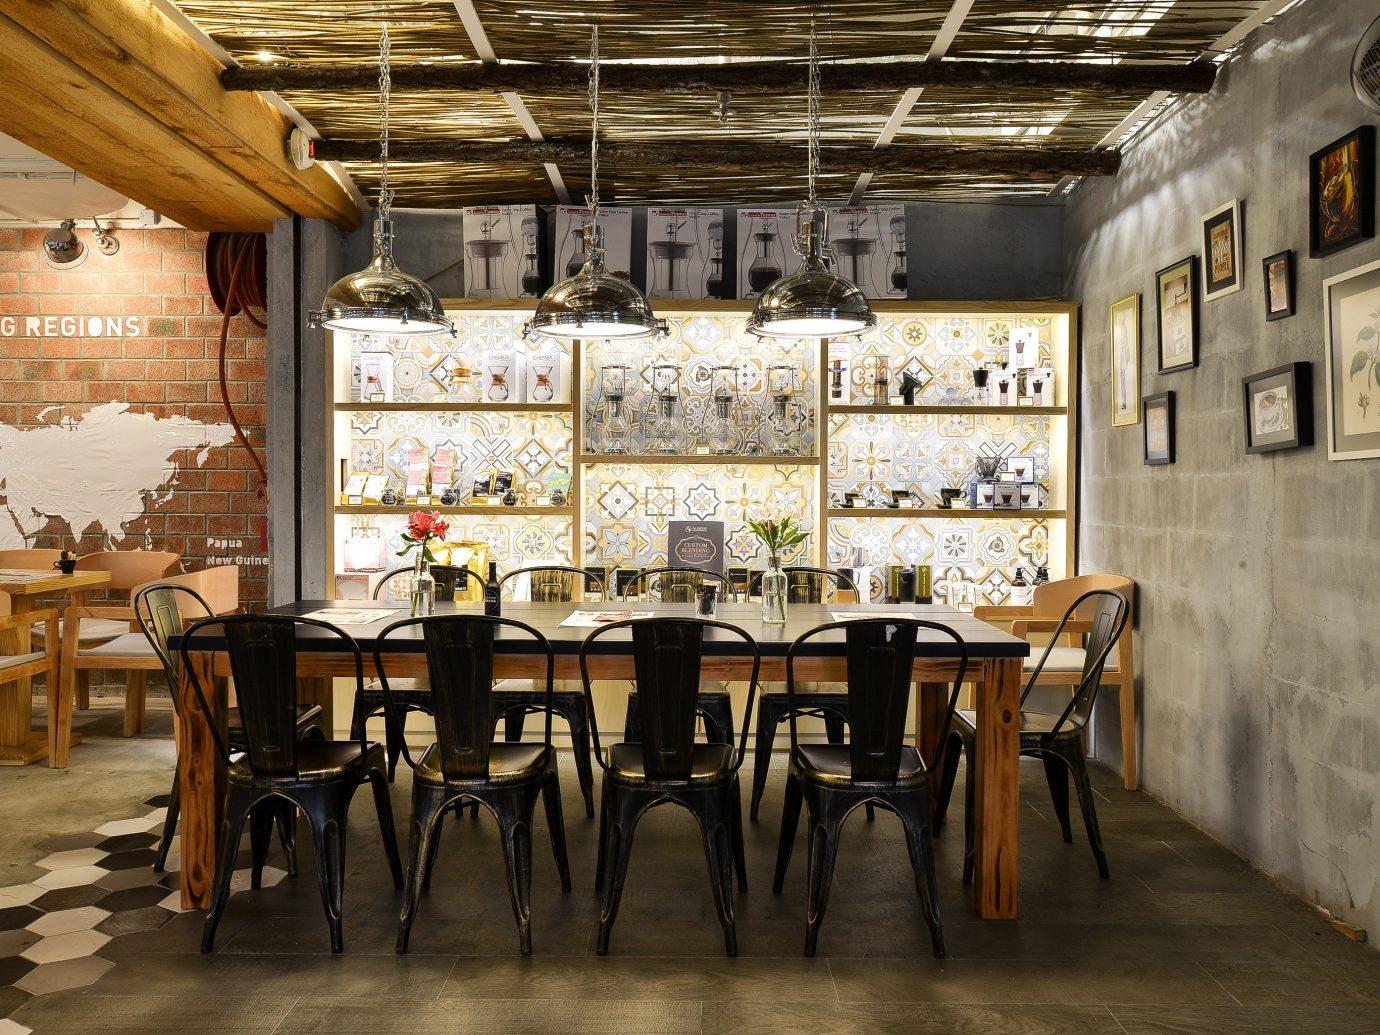 Food + Drink Offbeat Travel Trends floor indoor table chair interior design dining room restaurant furniture Dining café several